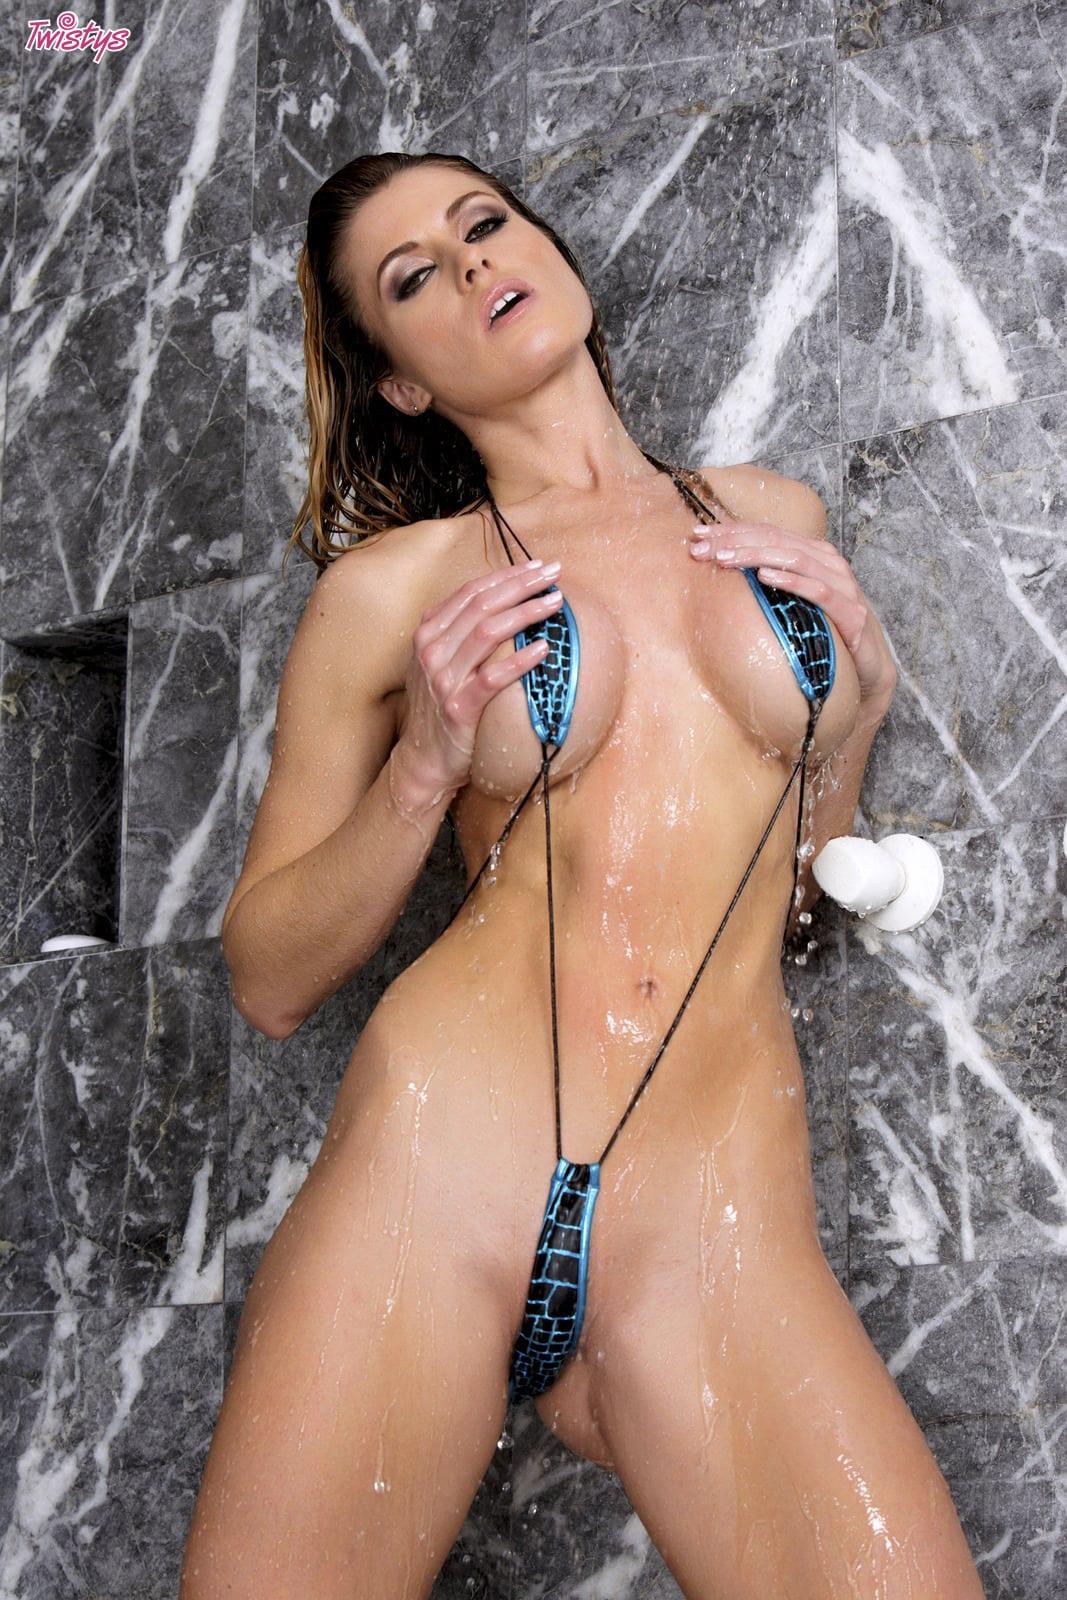 Randy moore takes a shower in her sling bikini photo